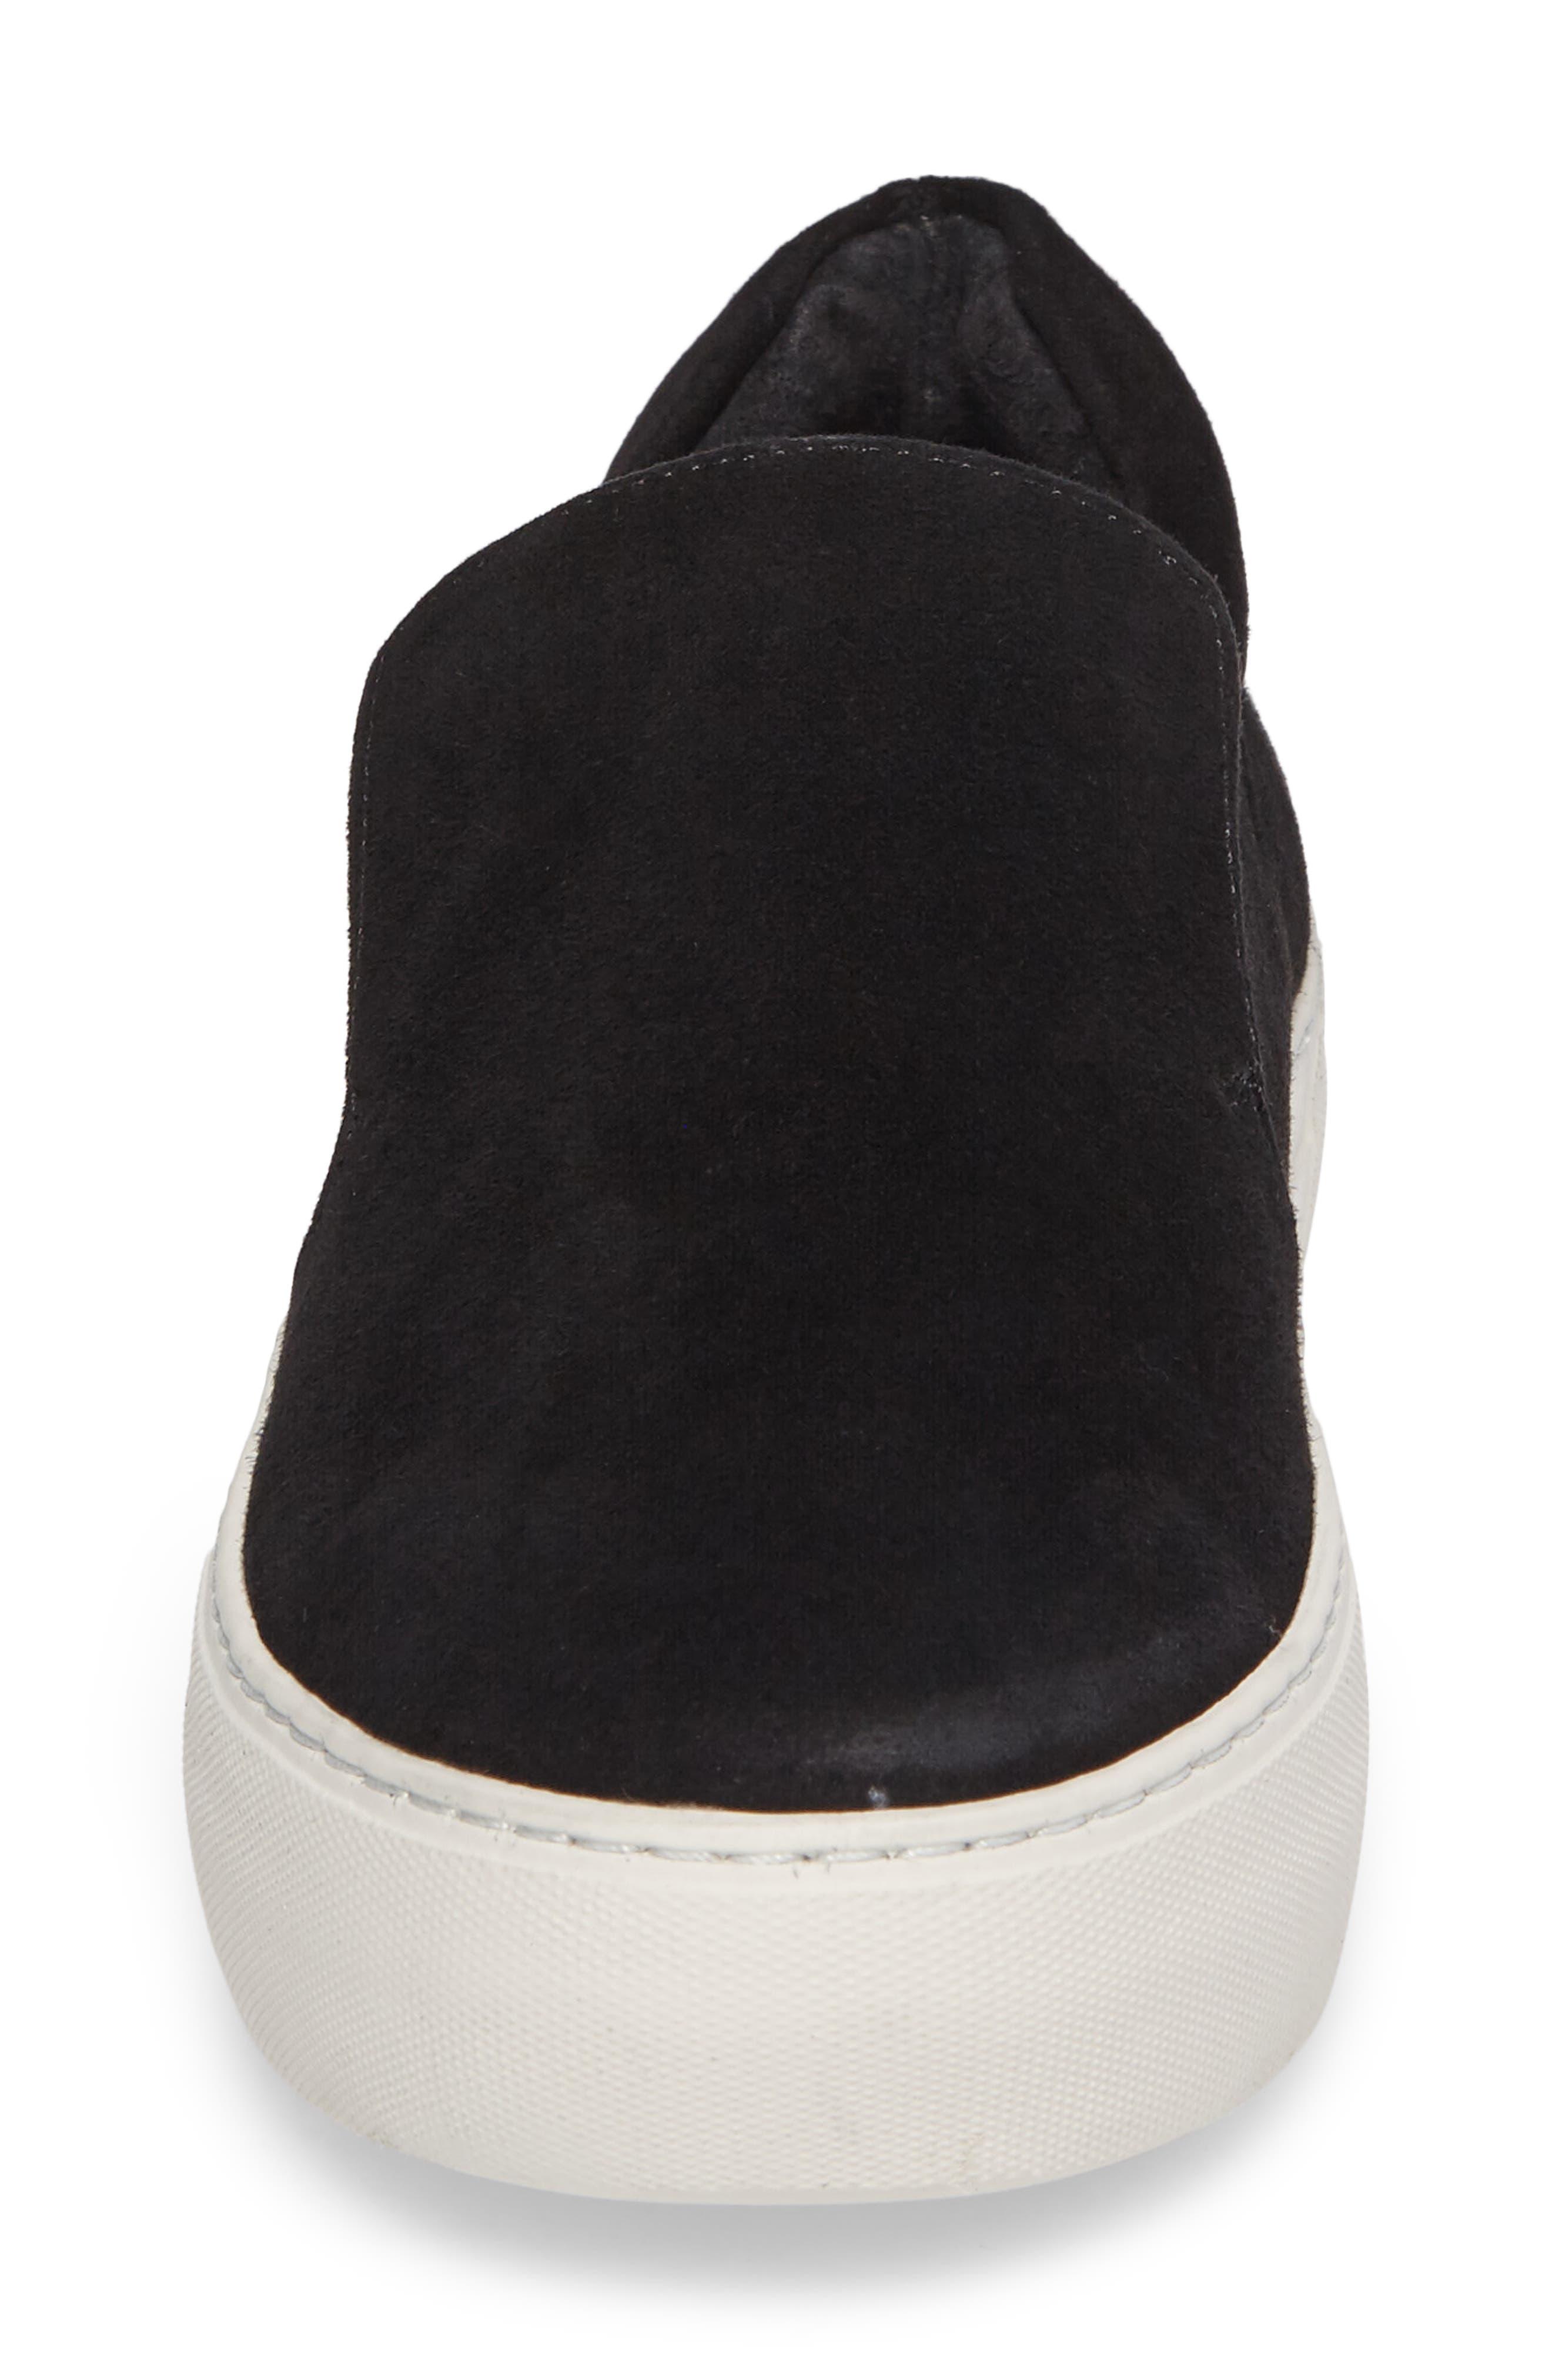 Acer Slip-On Sneaker,                             Alternate thumbnail 4, color,                             BLACK SUEDE